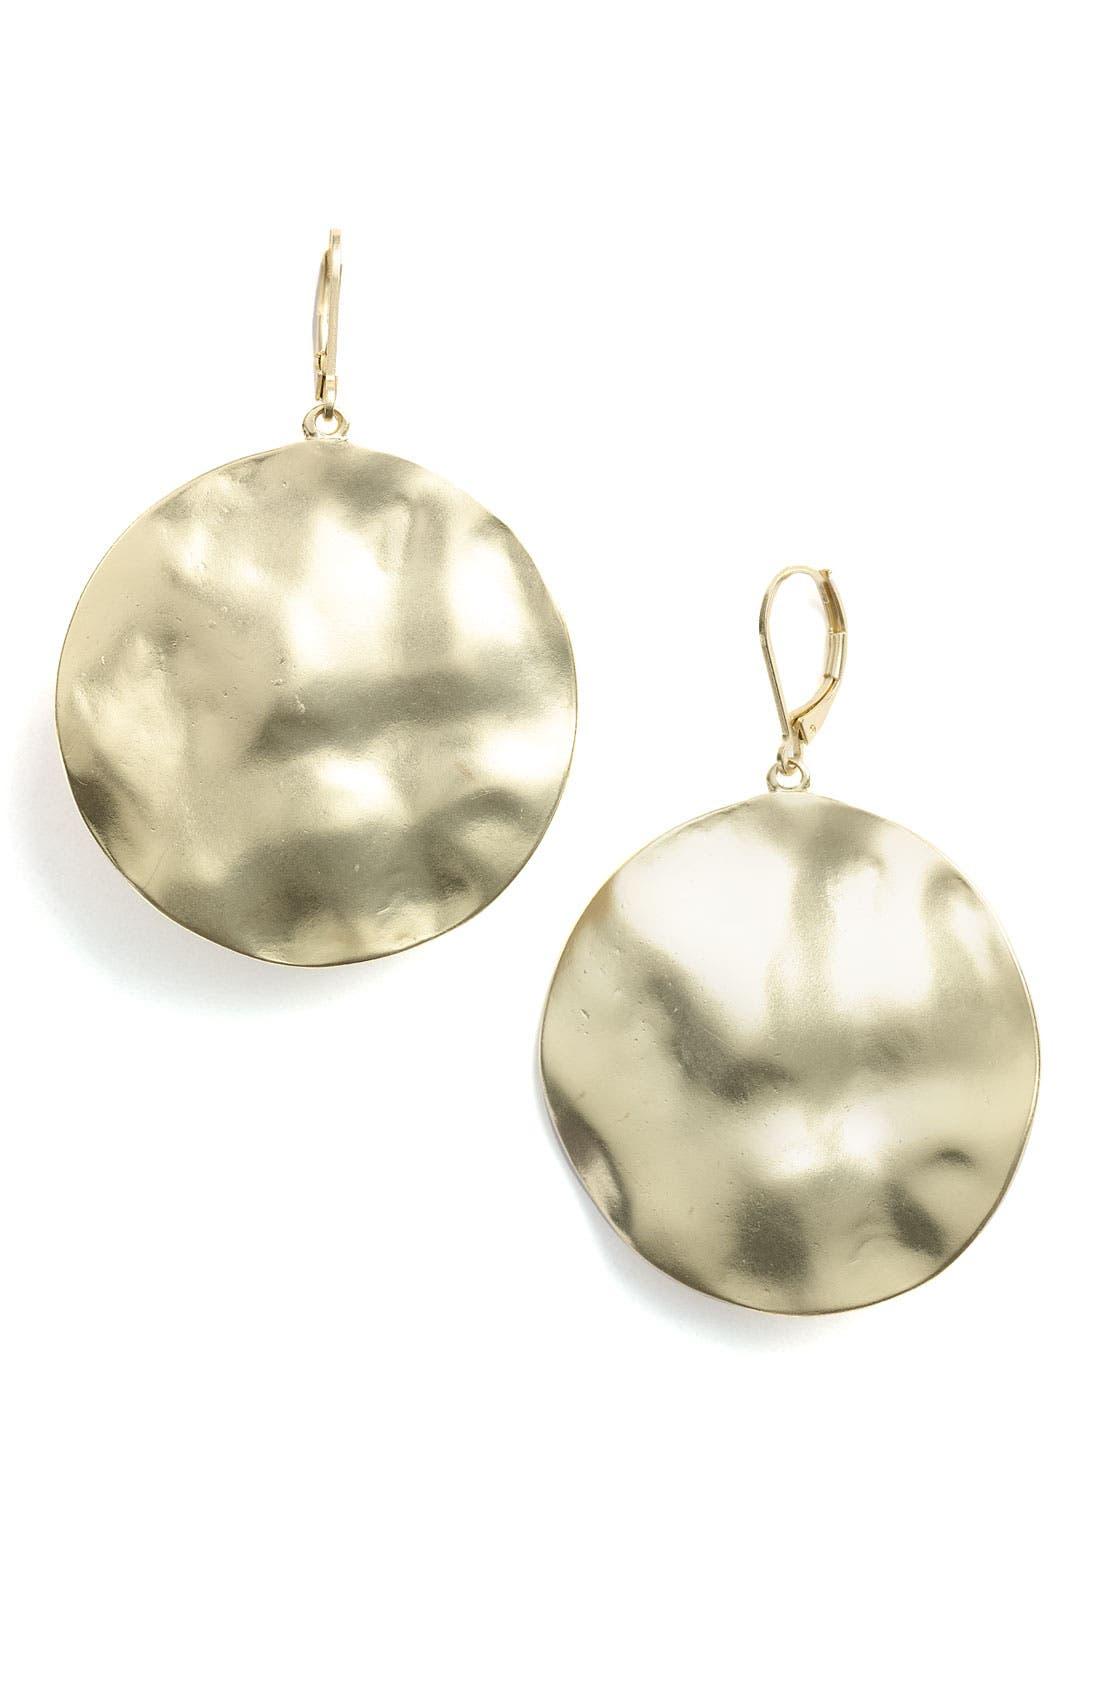 Alternate Image 1 Selected - Nordstrom 'Gold Water' Large Disc Drop Earrings